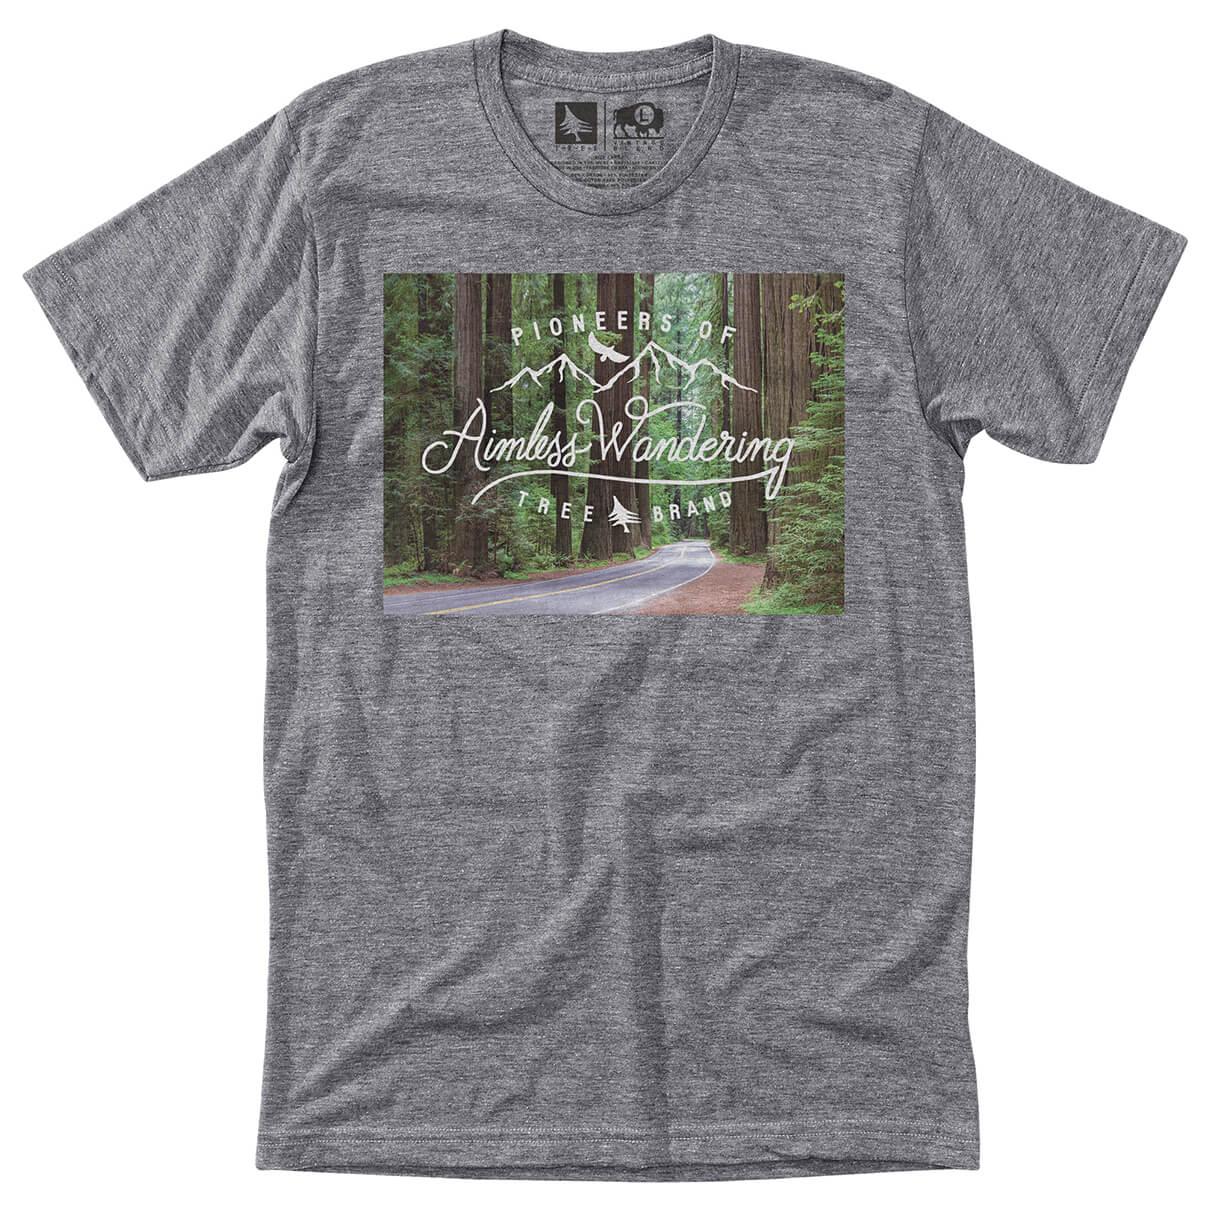 Hippy tree redwoods tee t shirt homme achat en ligne for Hippie t shirts australia